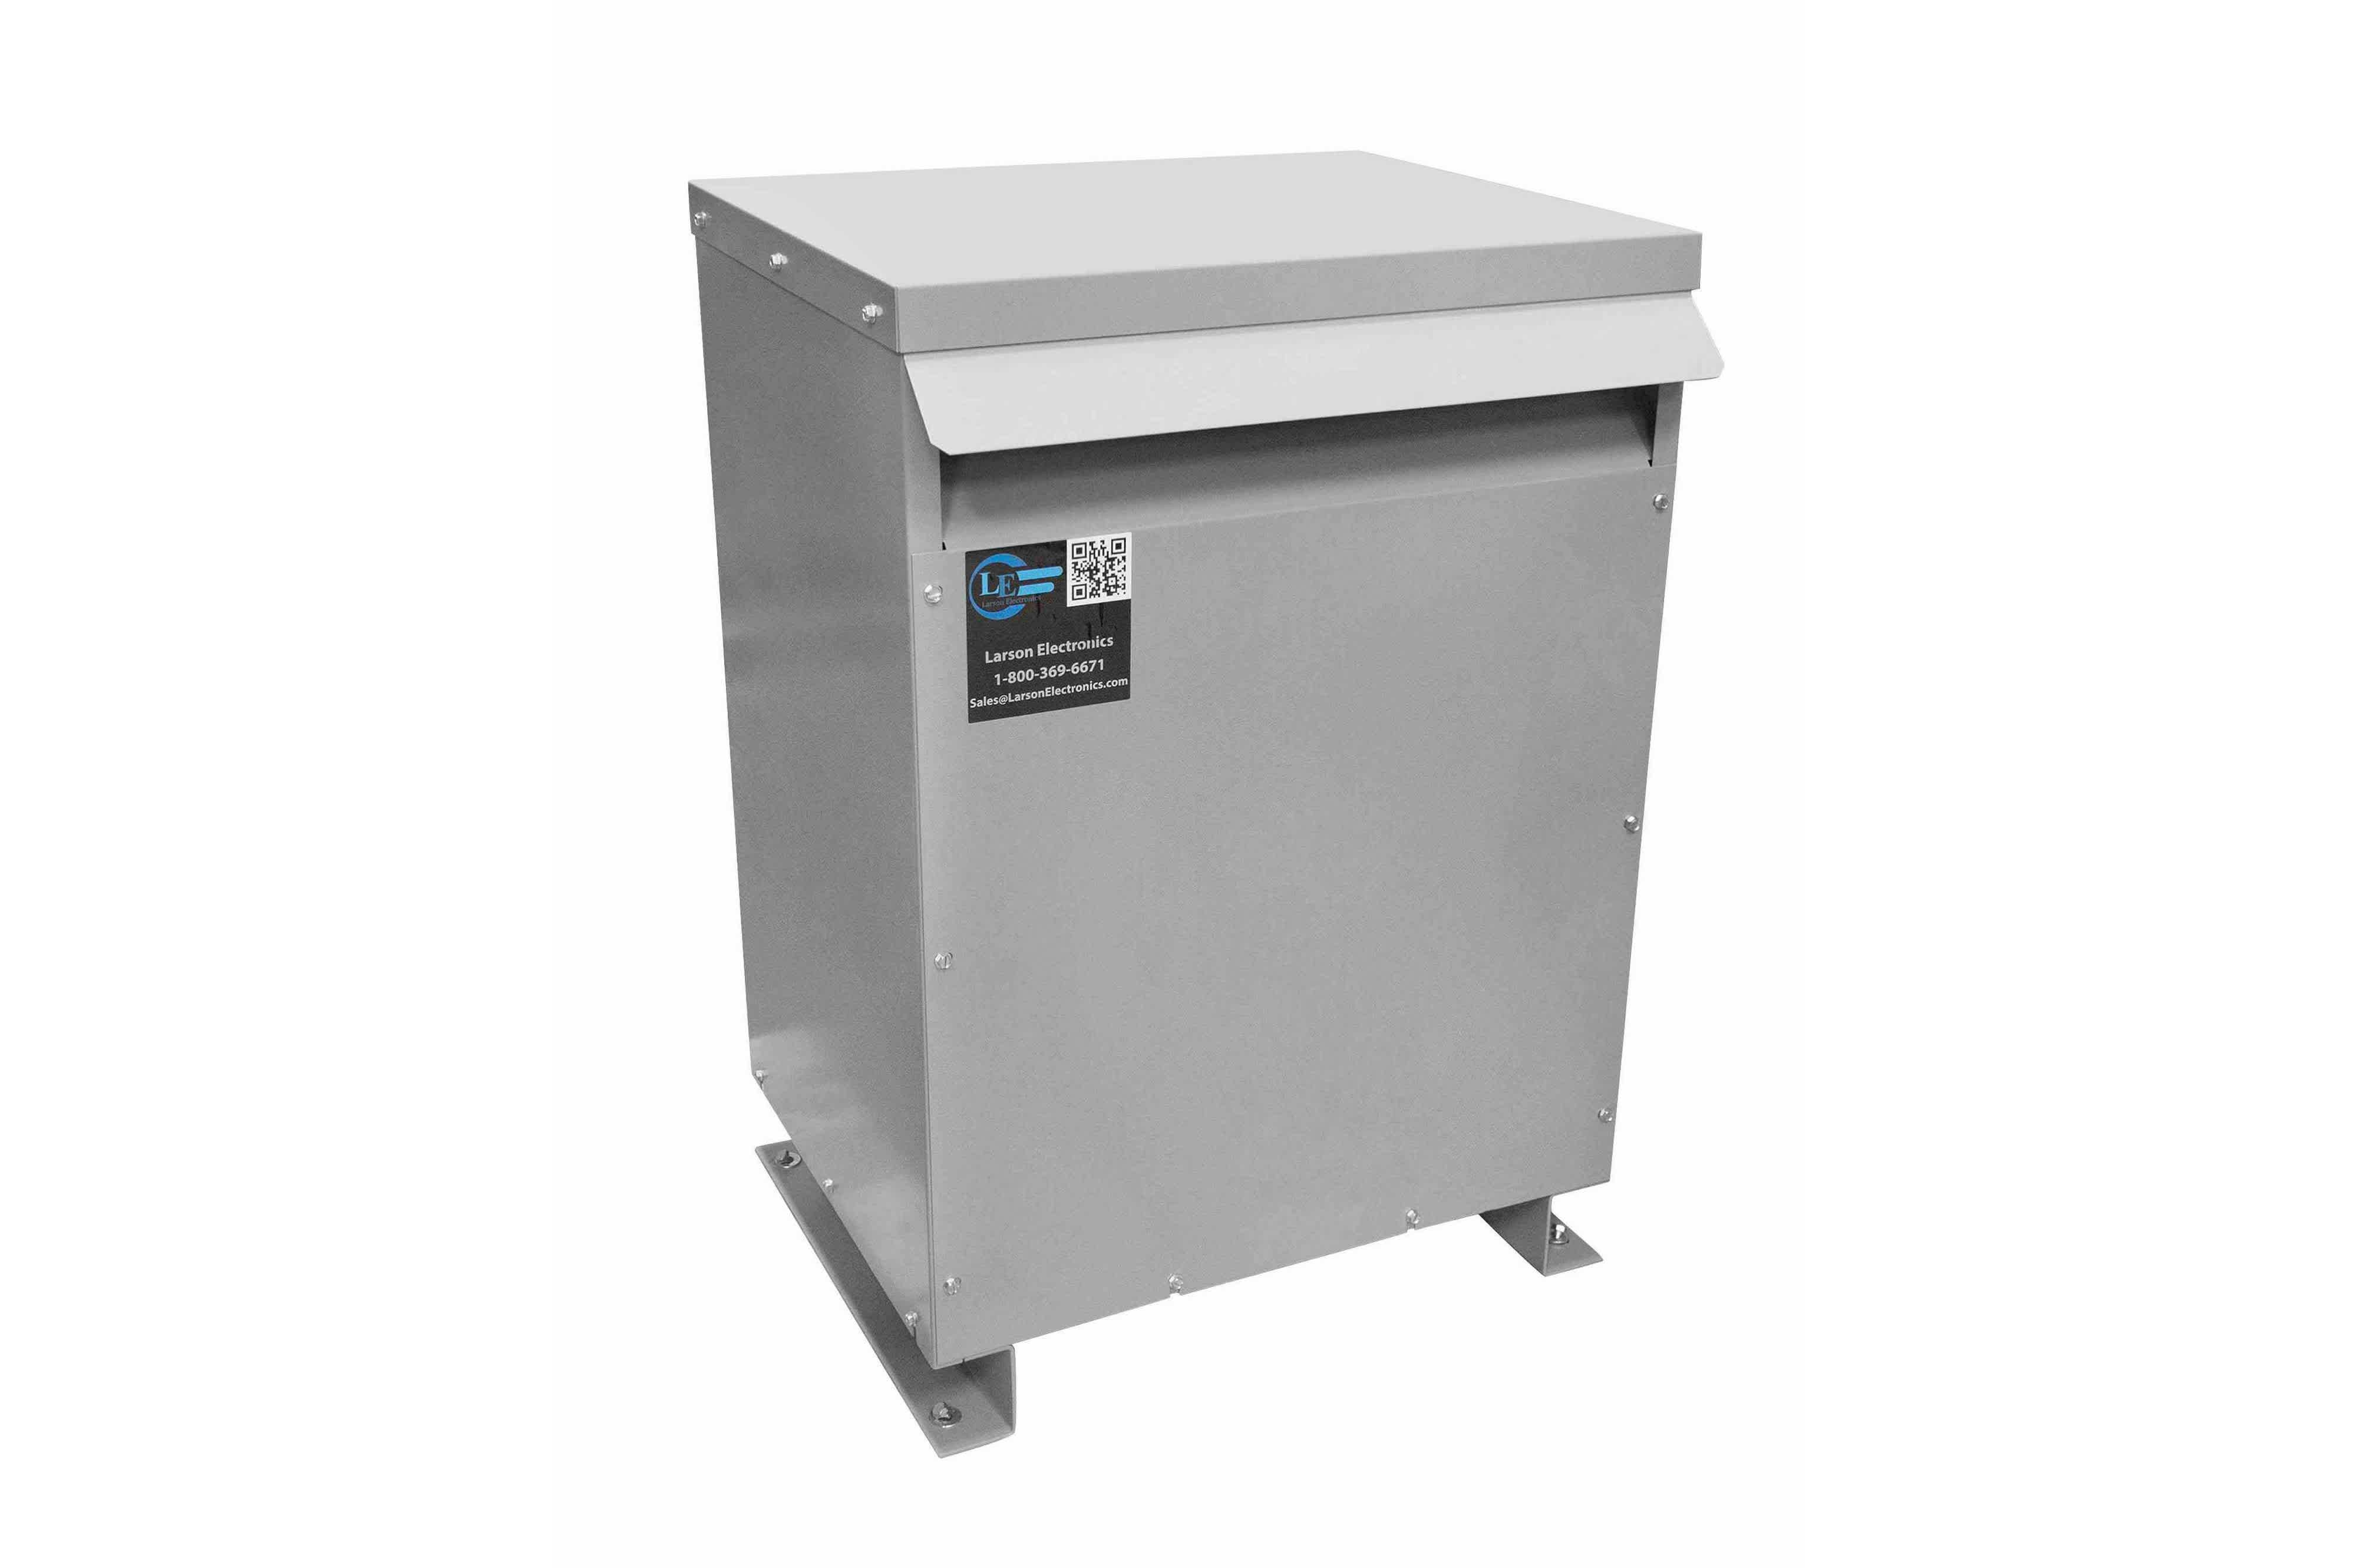 125 kVA 3PH Isolation Transformer, 220V Wye Primary, 480Y/277 Wye-N Secondary, N3R, Ventilated, 60 Hz